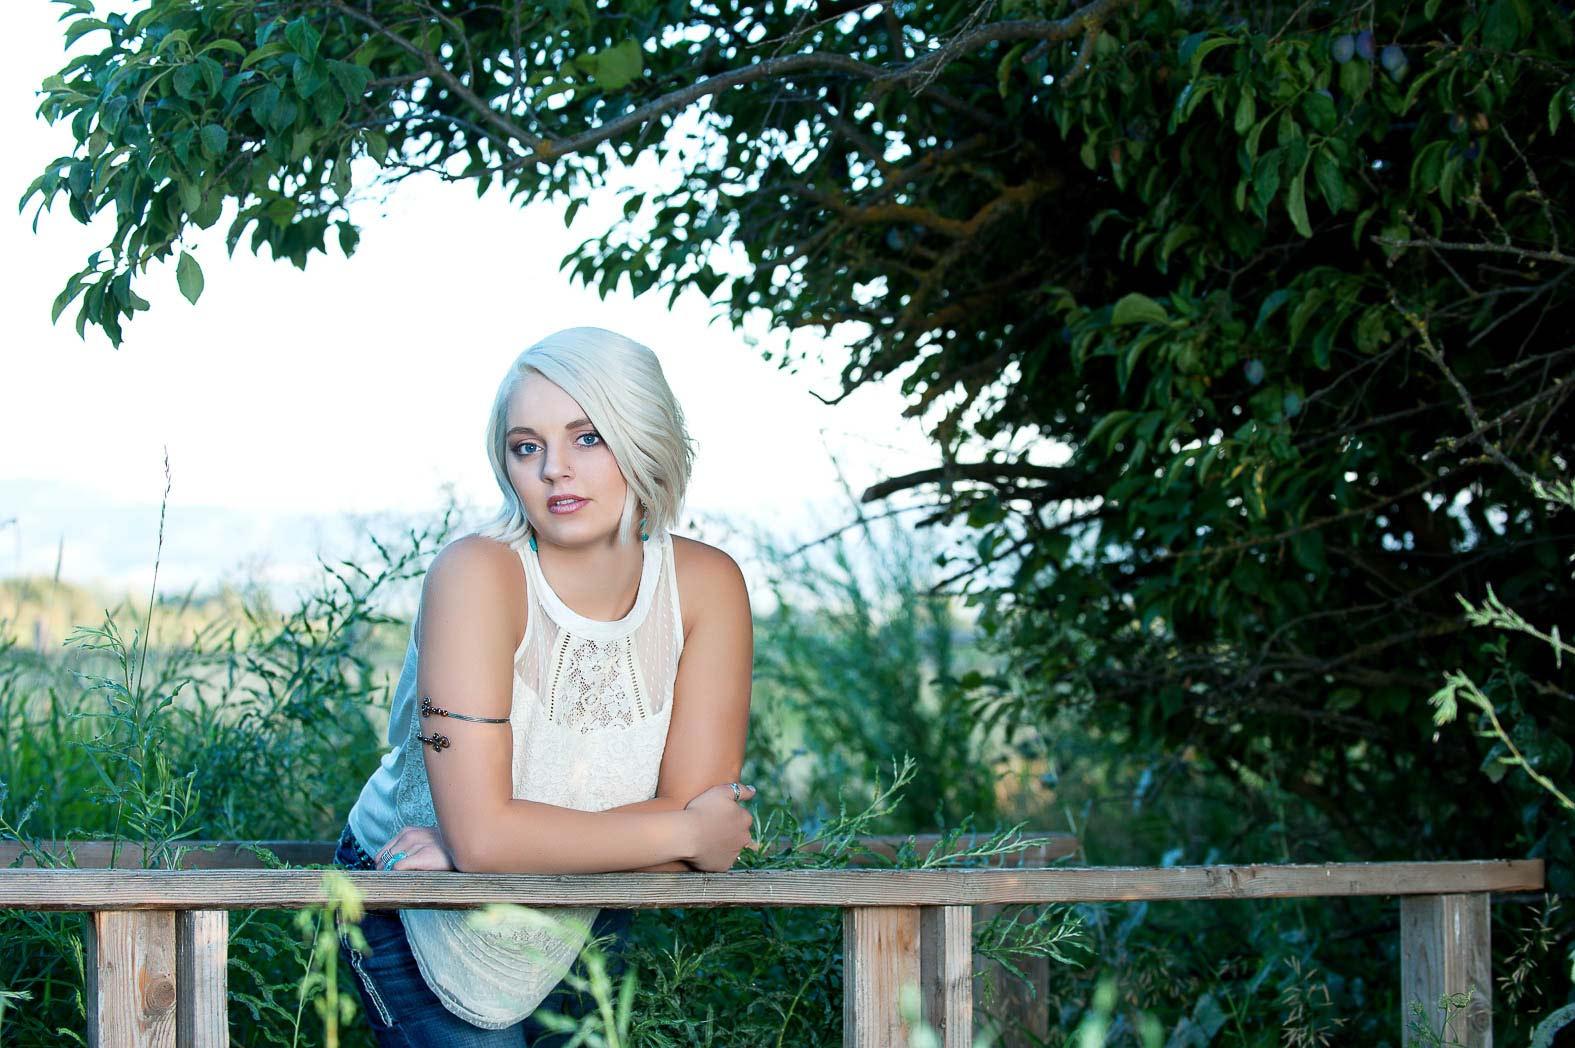 karina-country-girl-beauty-senior-pictures-photonuvo